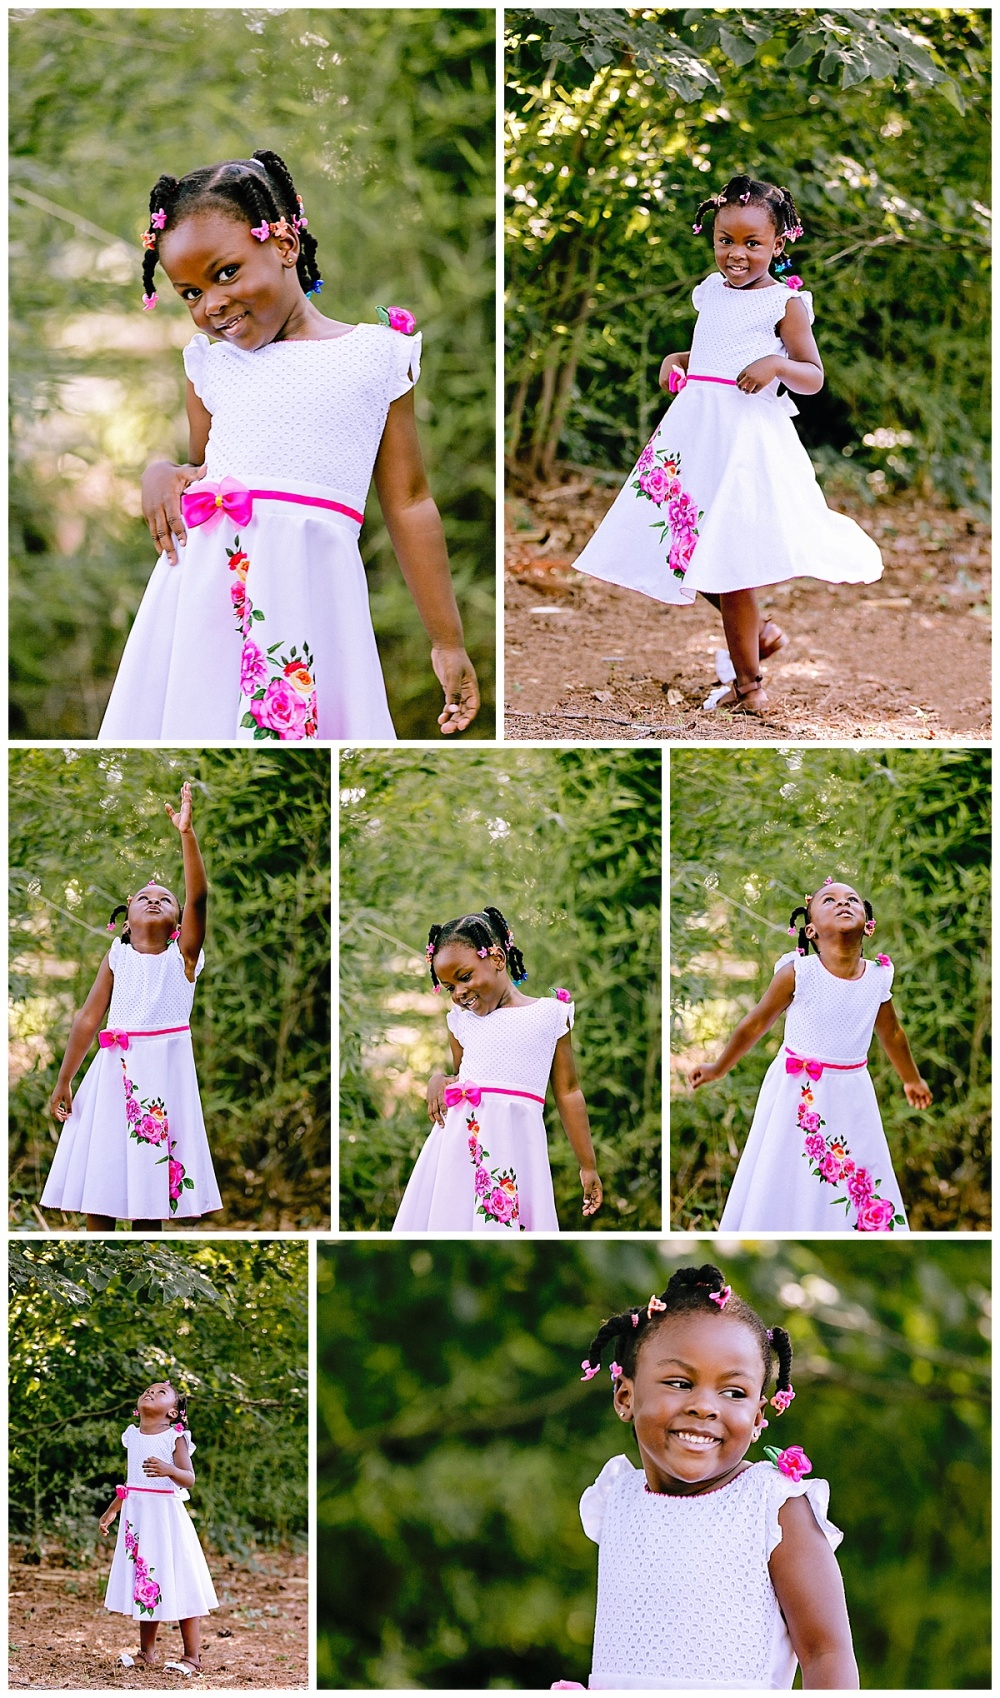 Carly-Barton-Photography-Family-Session-Kilgore-Texas-Twins-1-year-birthday-cake-smash-Olowo-family-photos_0023.jpg